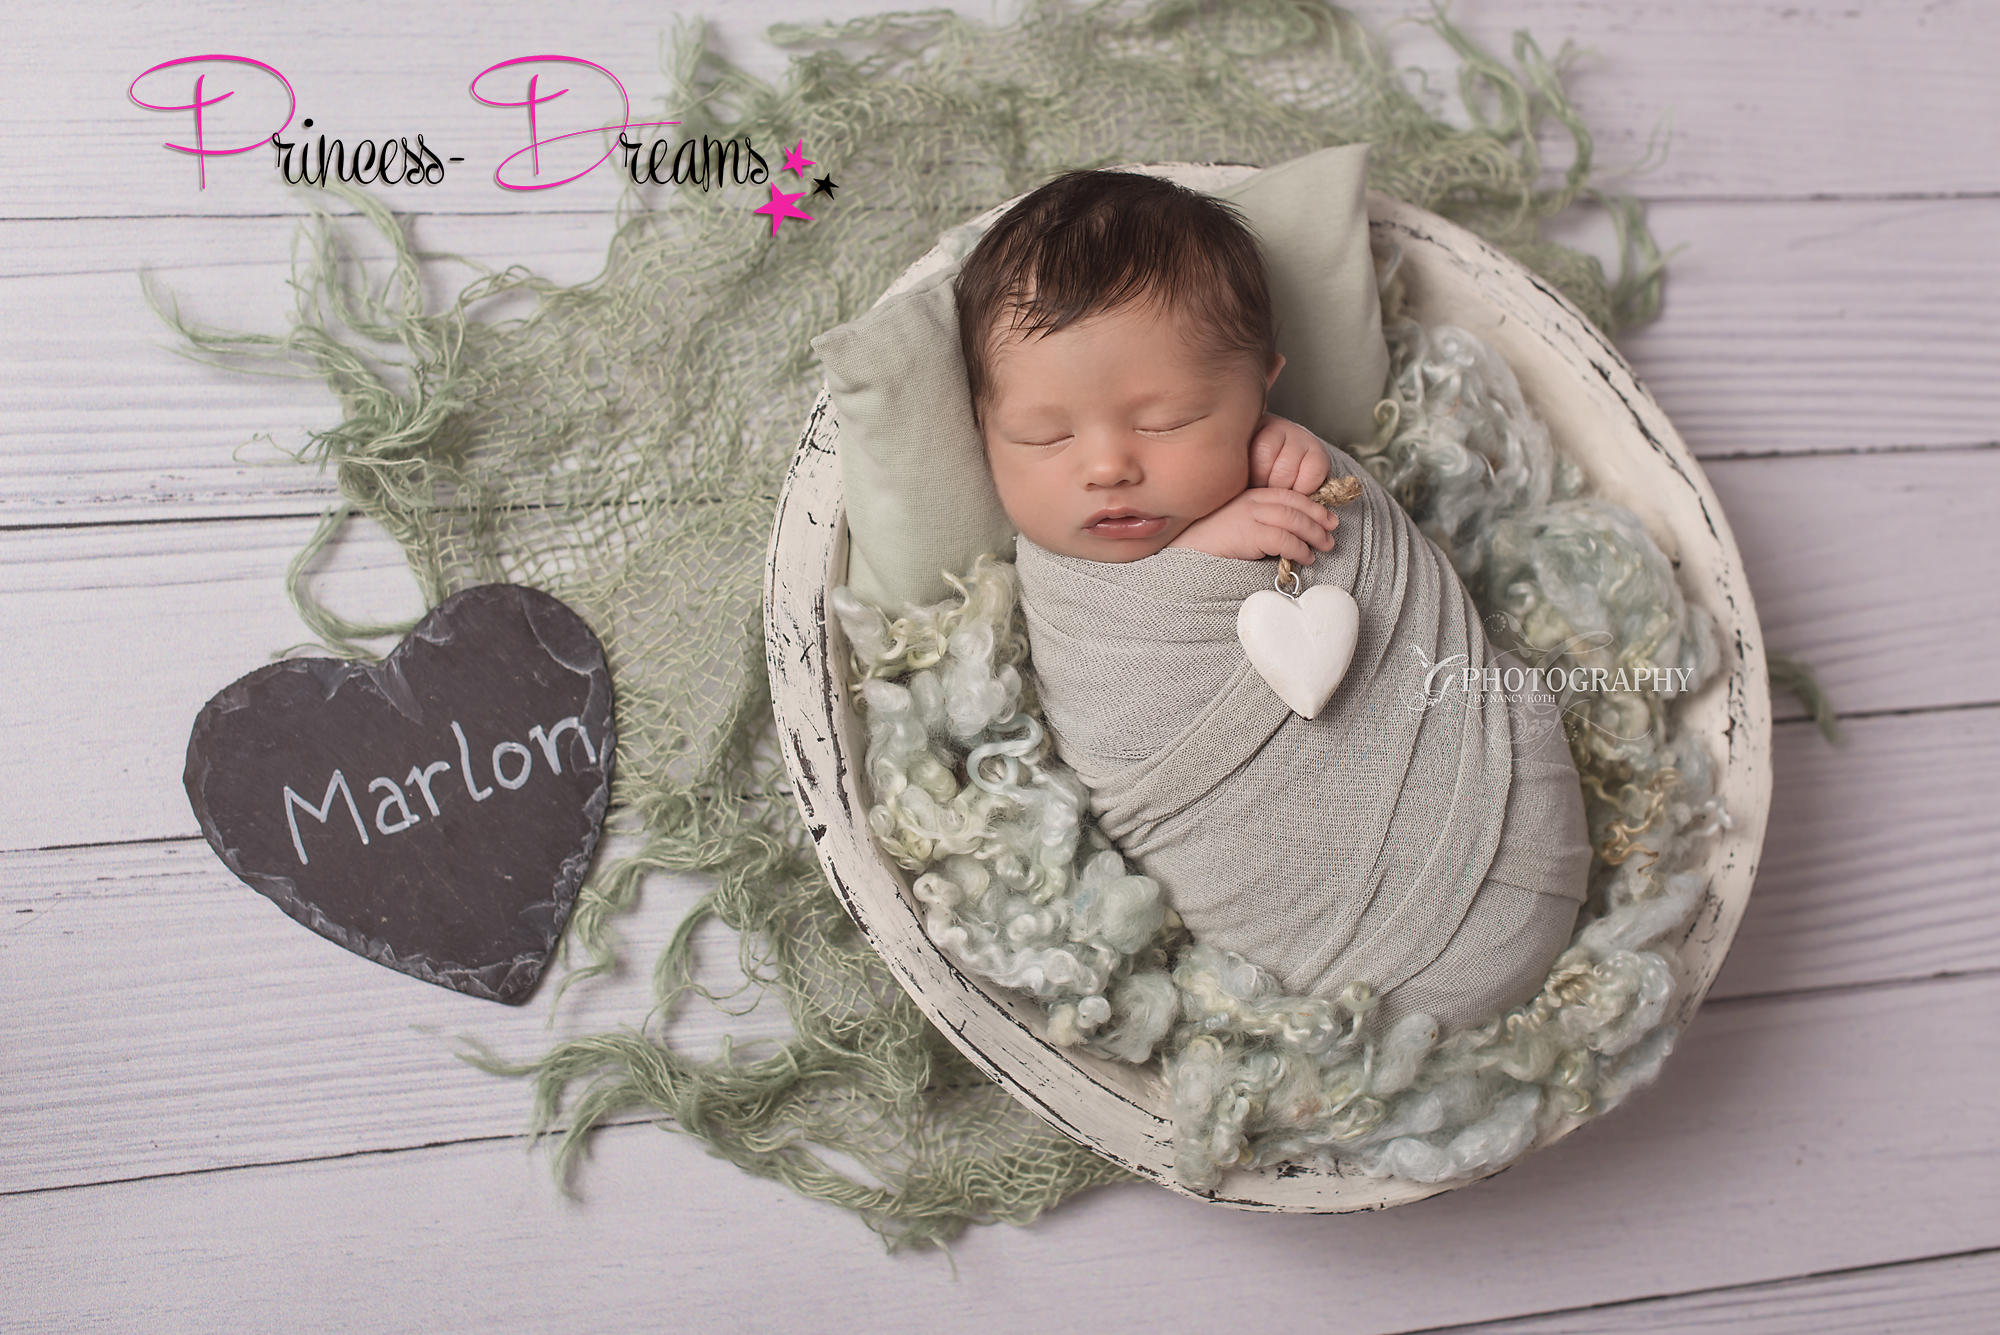 Neugeborenen Mütze, Newborn Mütze, Mütze Baby, Neugeborenen fotografie,baby shooting fotoshooting Fotoaccessoire baby Baby mütze Wrap Tuch Set Outfit